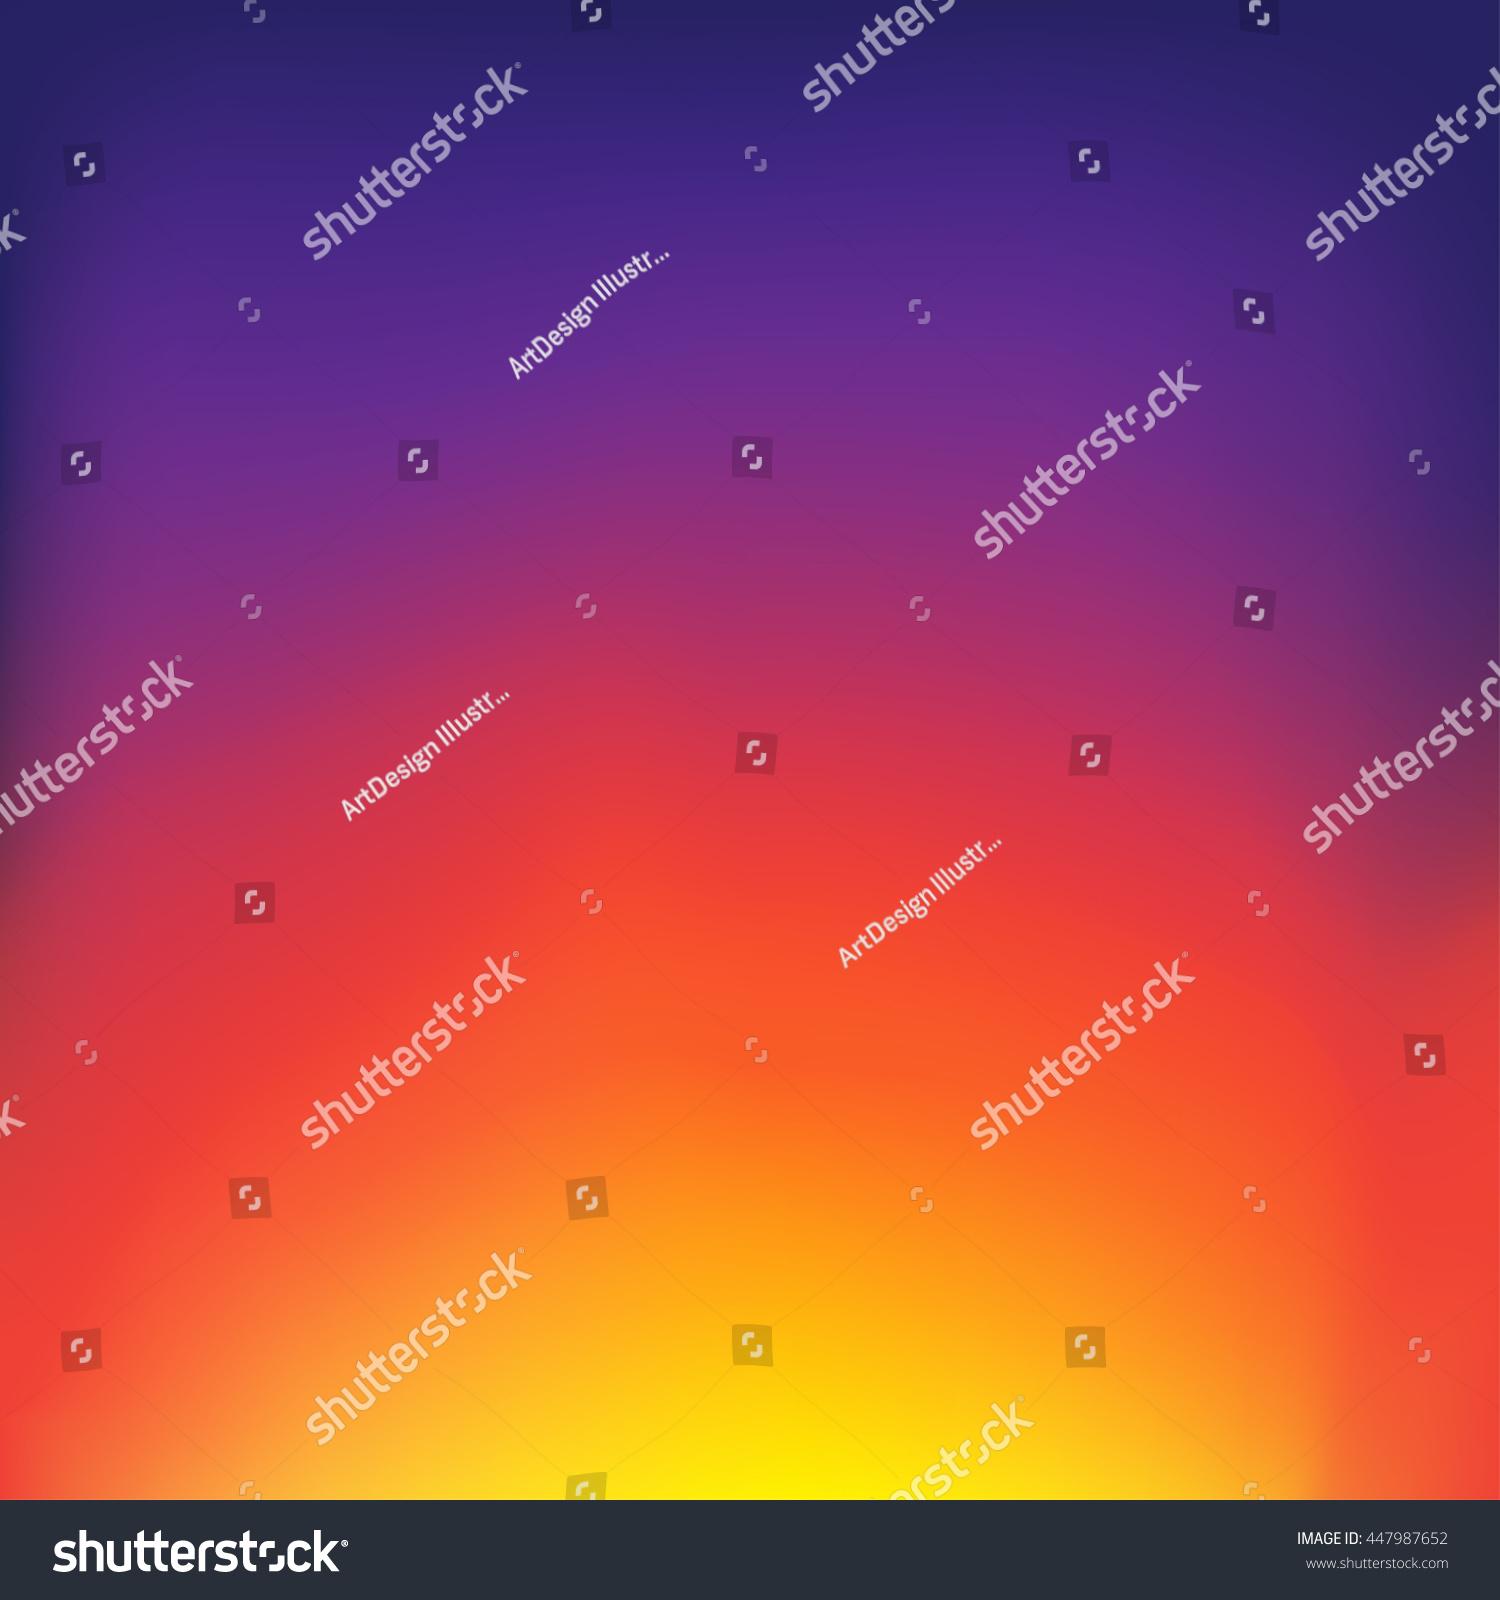 instagram banner 2016 sunset smartphone background android wallpaper phone icon instagram banner